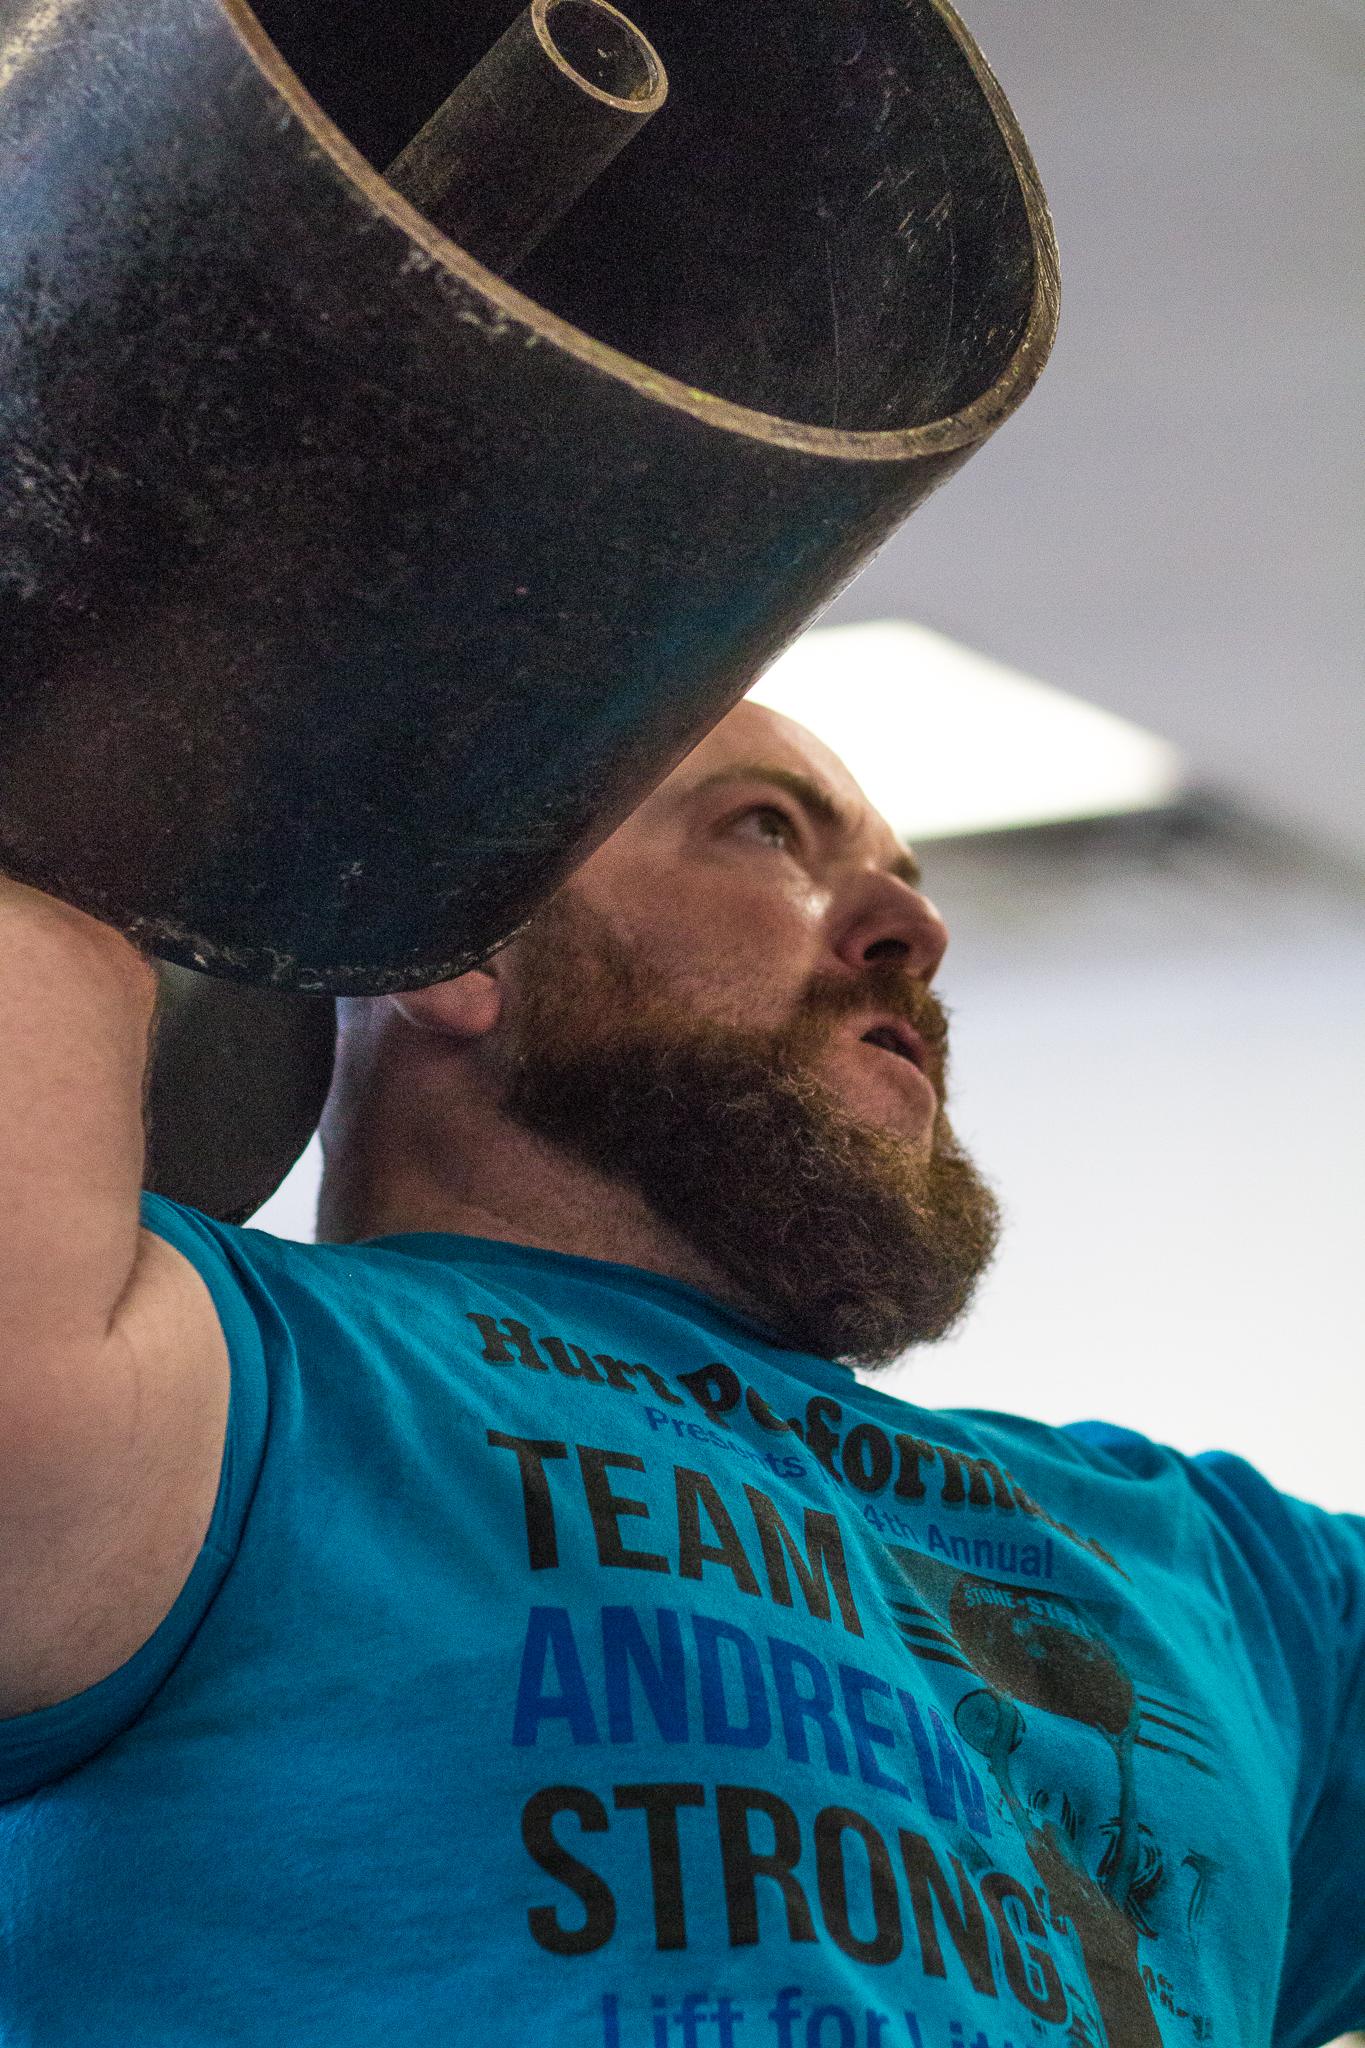 hurt-performance-4th-annual-little-viking-charity-washingtonville-new-york-strongman-eveyrdaylifters-vp (215 of 348).jpg